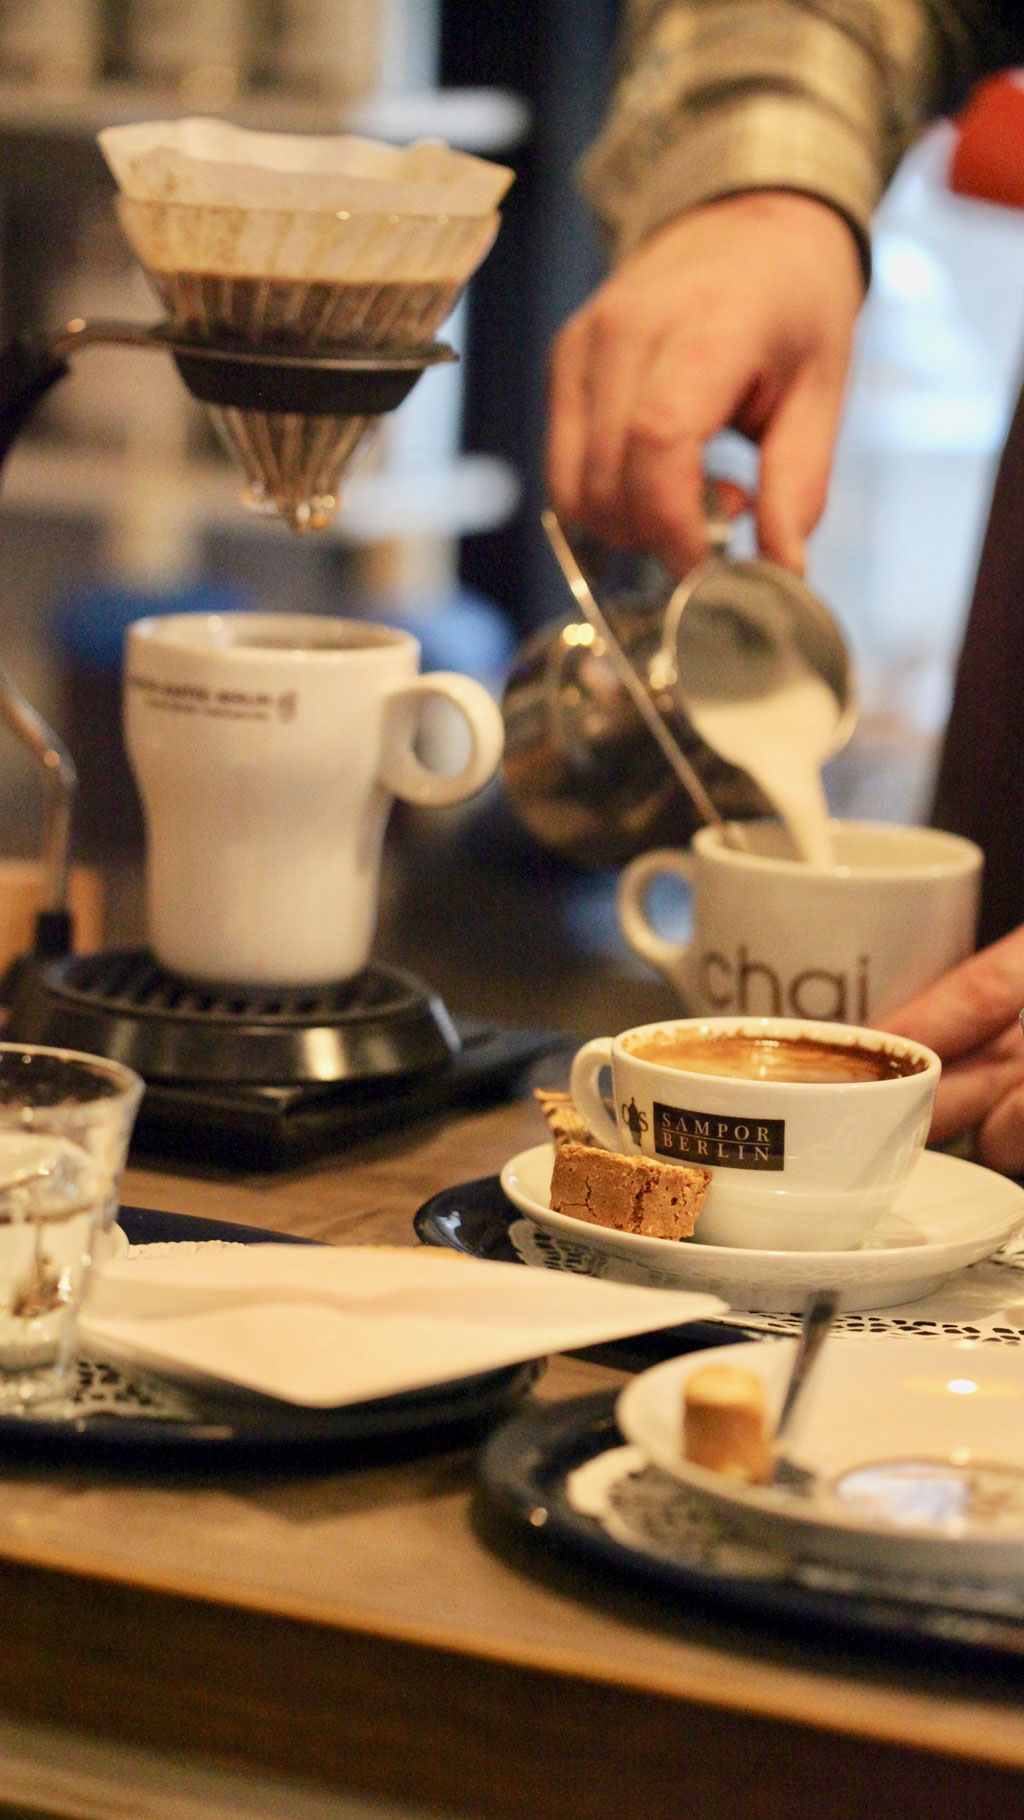 SKB / Kaffee mit Profil · Kaffeezubereitung · Latte Art